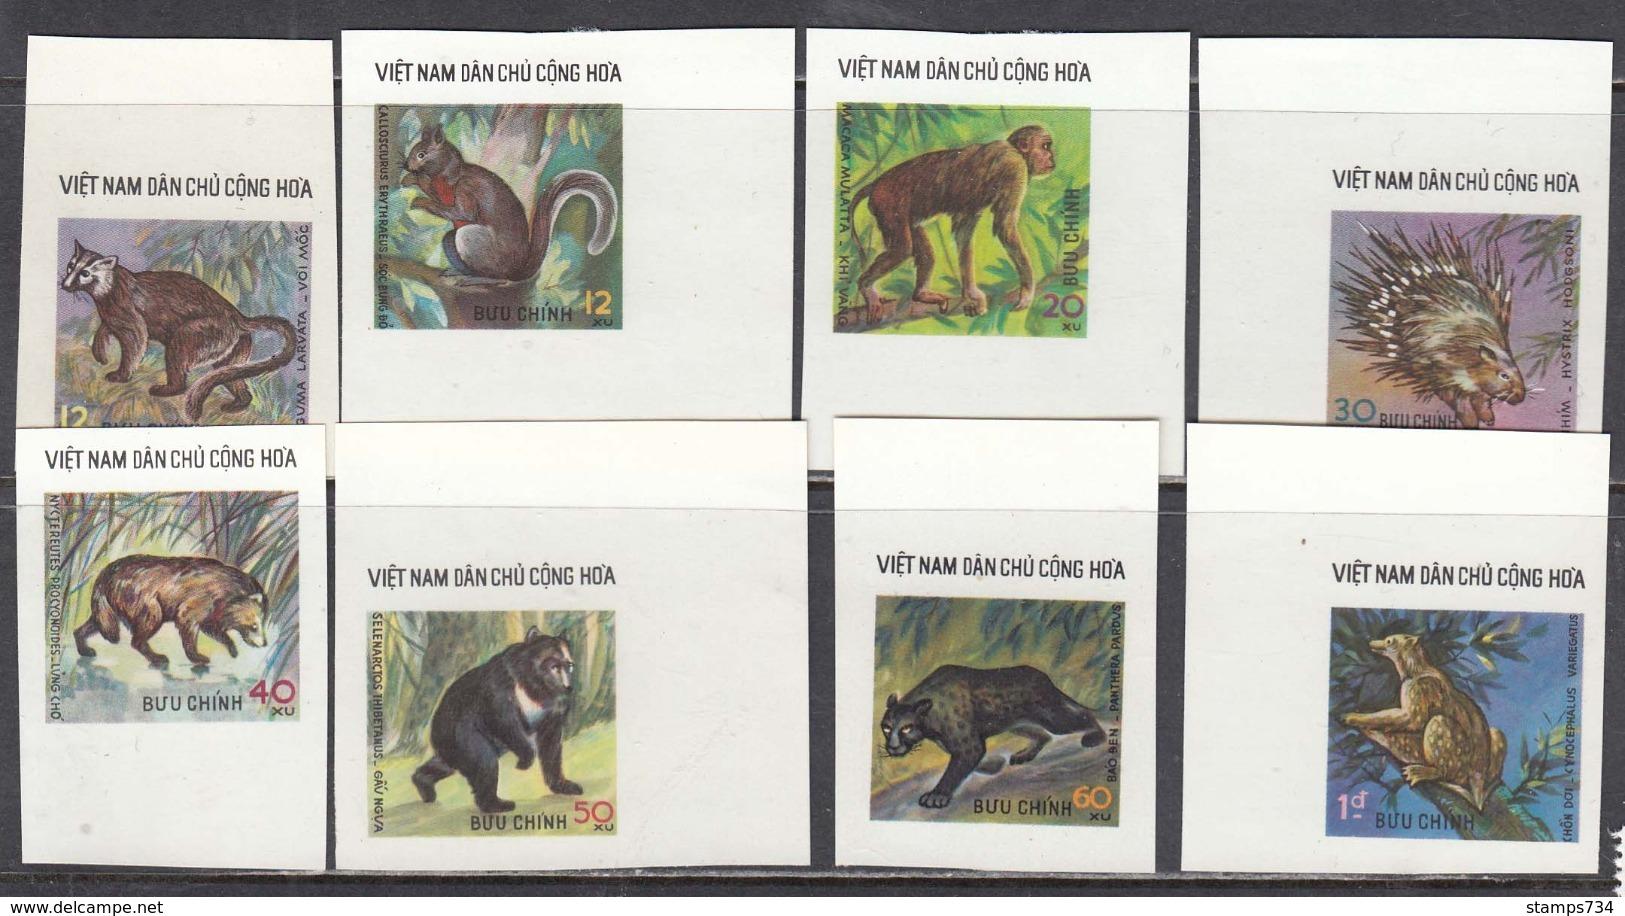 Vietnam 1976 - Wildlife Animals, Mi-Nr. 843/50, Imperforated, MNH** - Vietnam